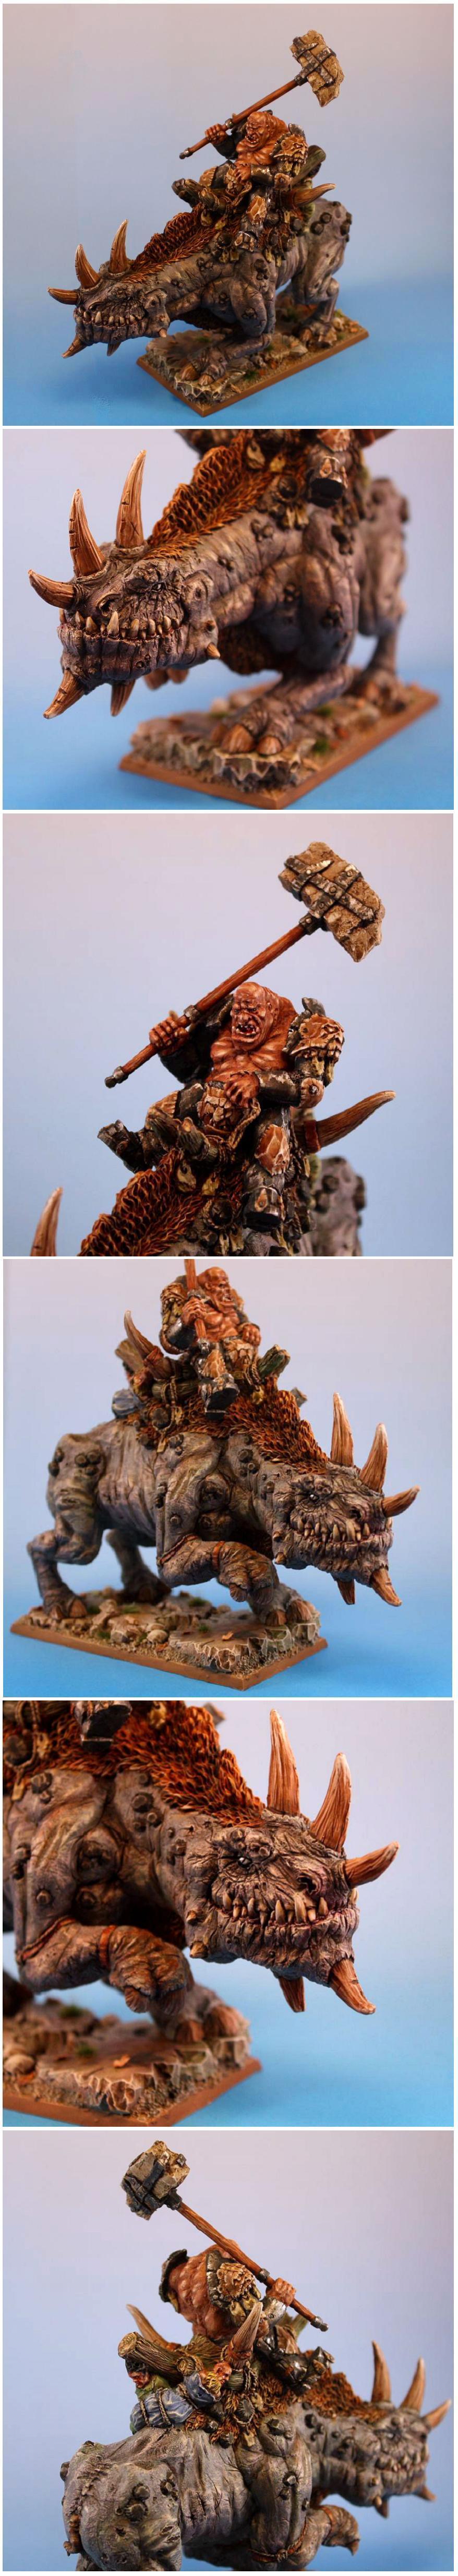 Ogre War Rhino Rider